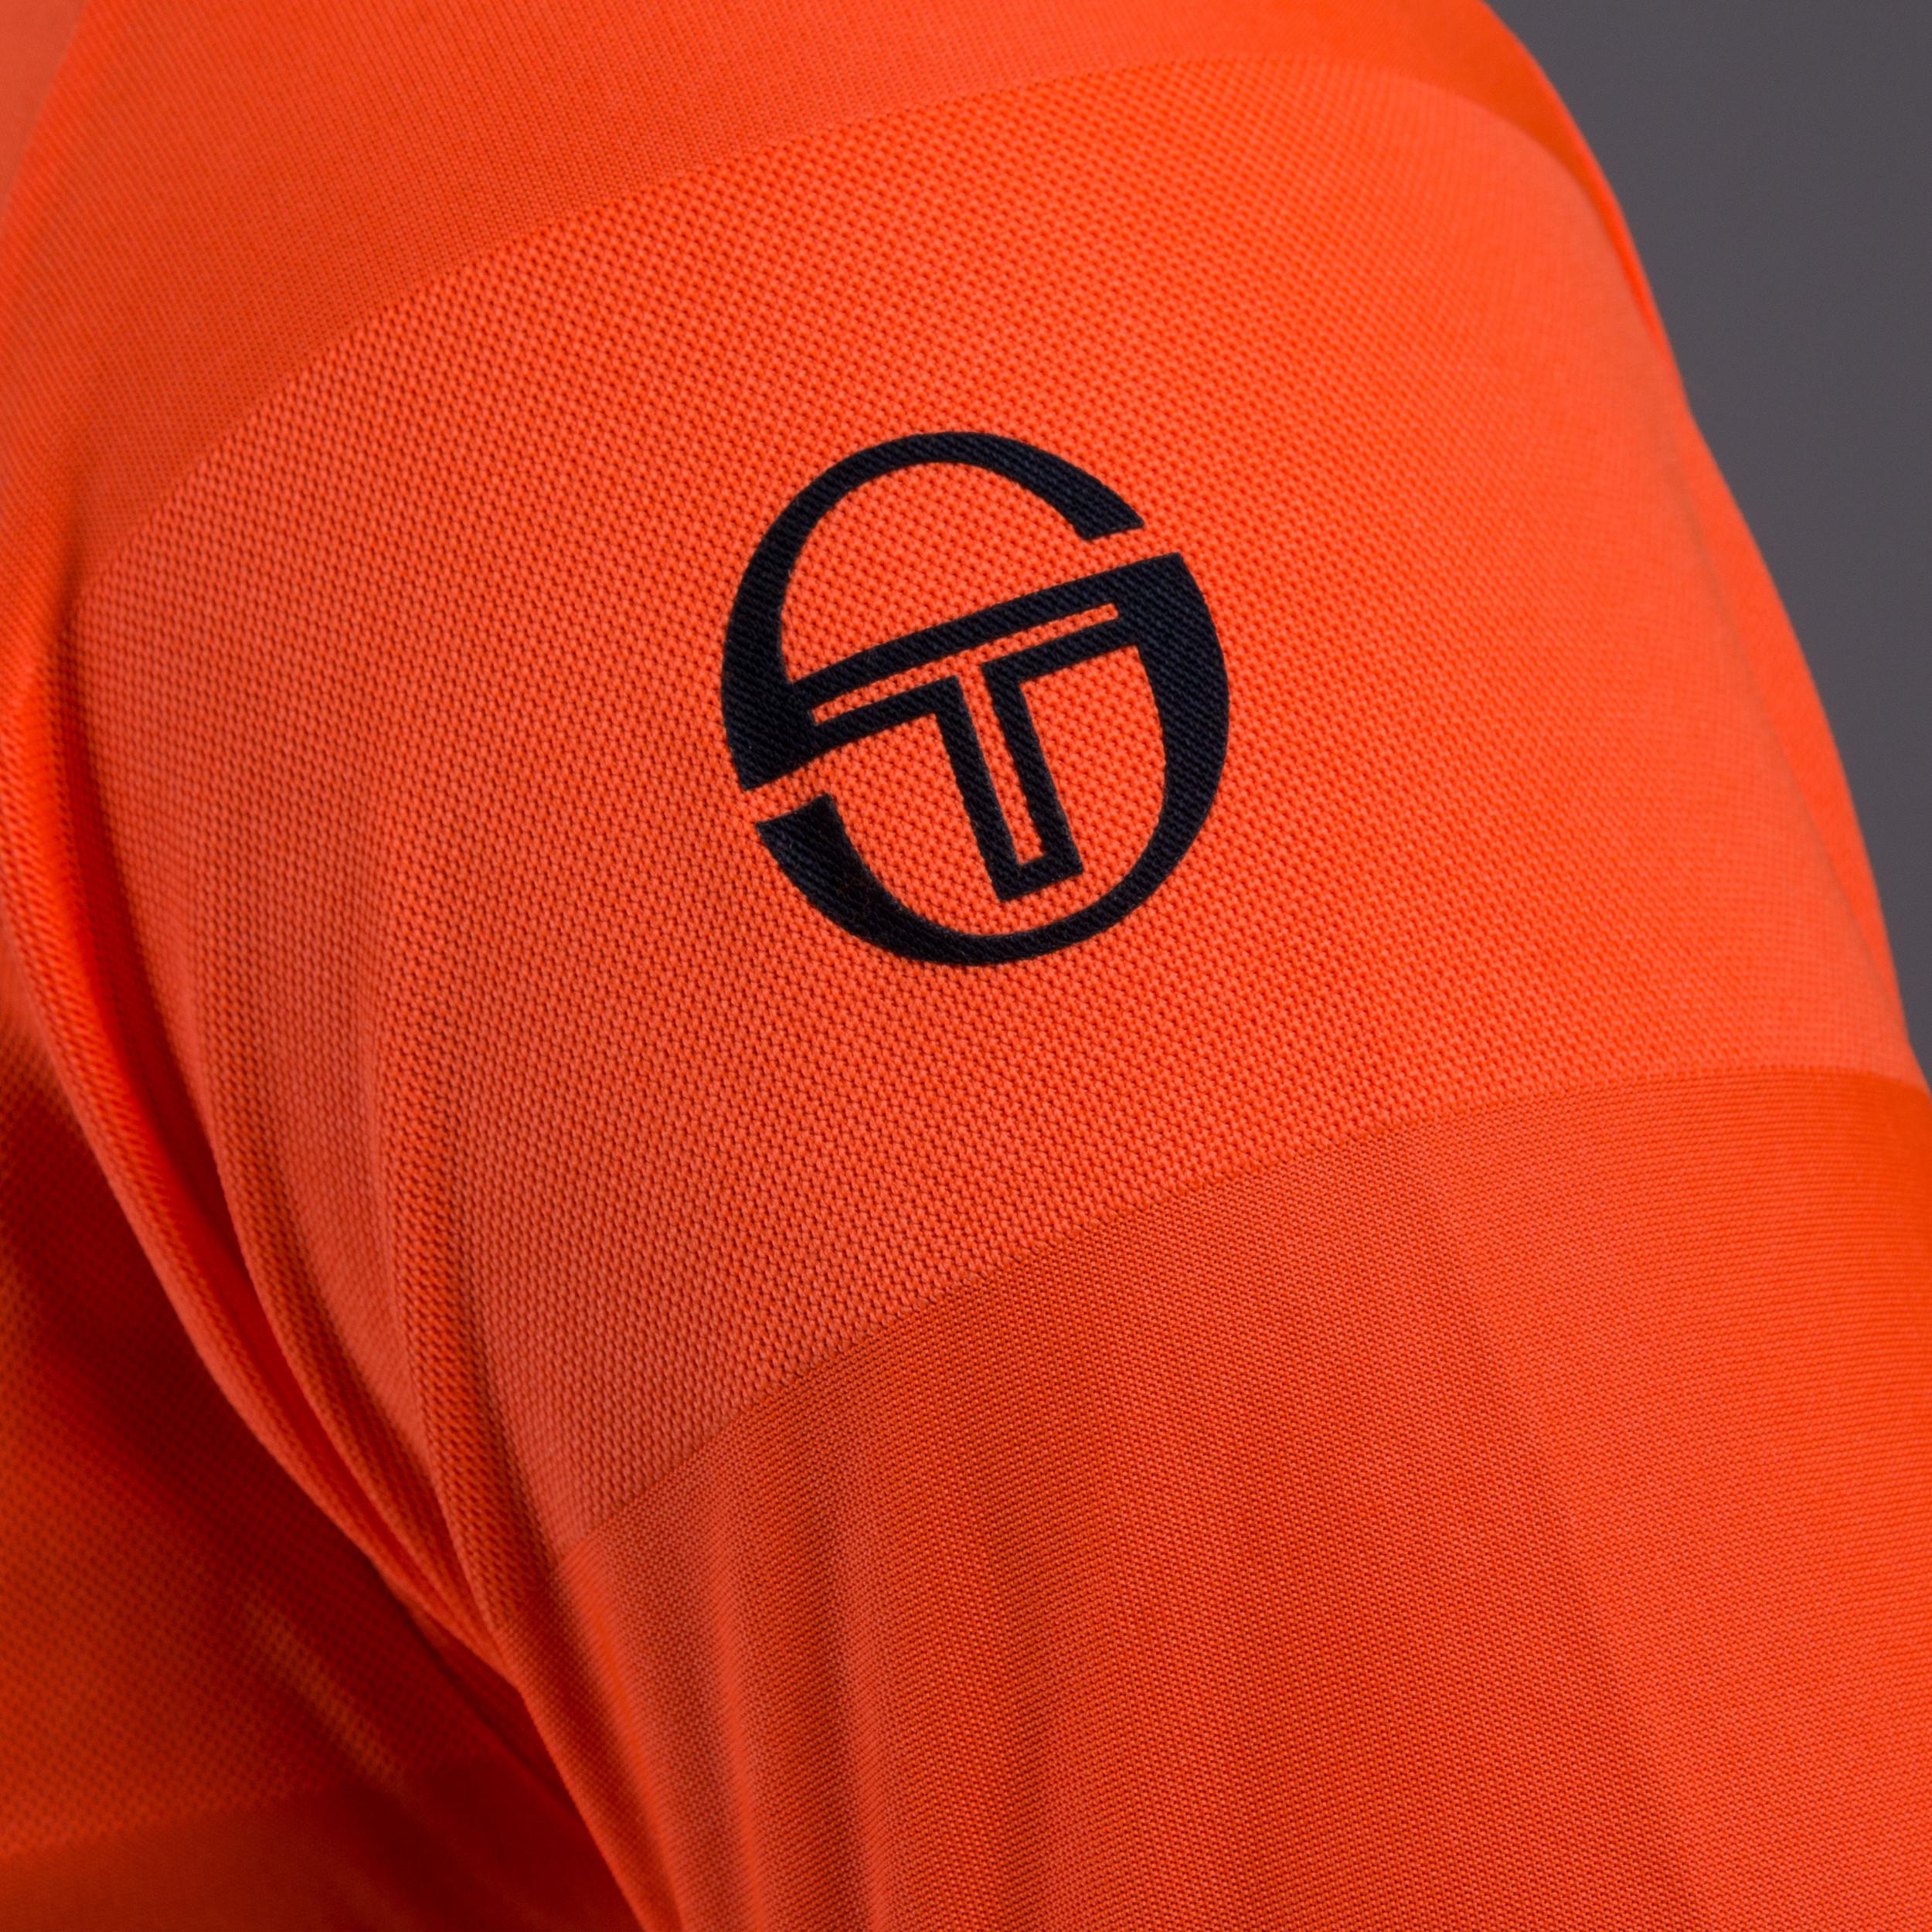 Sergio Tacchini Mens Retro Polo White Sports Tennis Breathable Lightweight